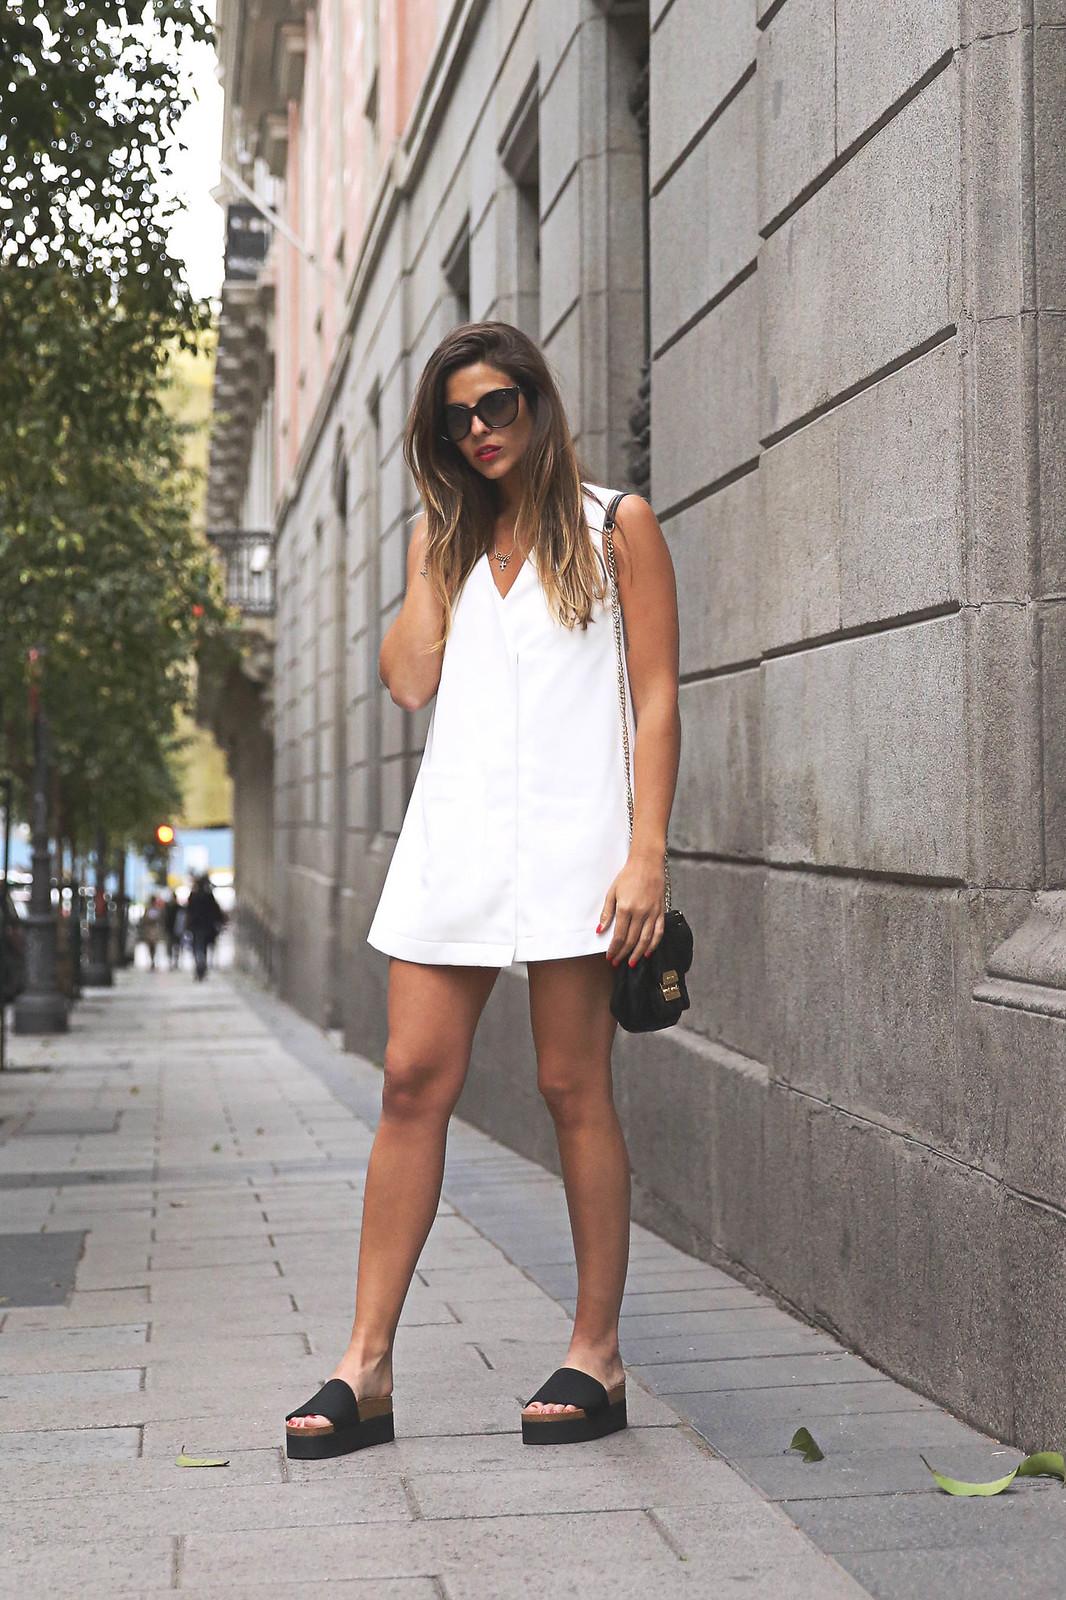 trendy-taste-look-outfit-street-style-ootd-blog-blogger-fashion-spain-moda-españa-steve-madden-mono-overall-playsuit-sandalias-michael-kors-white-blanco-1